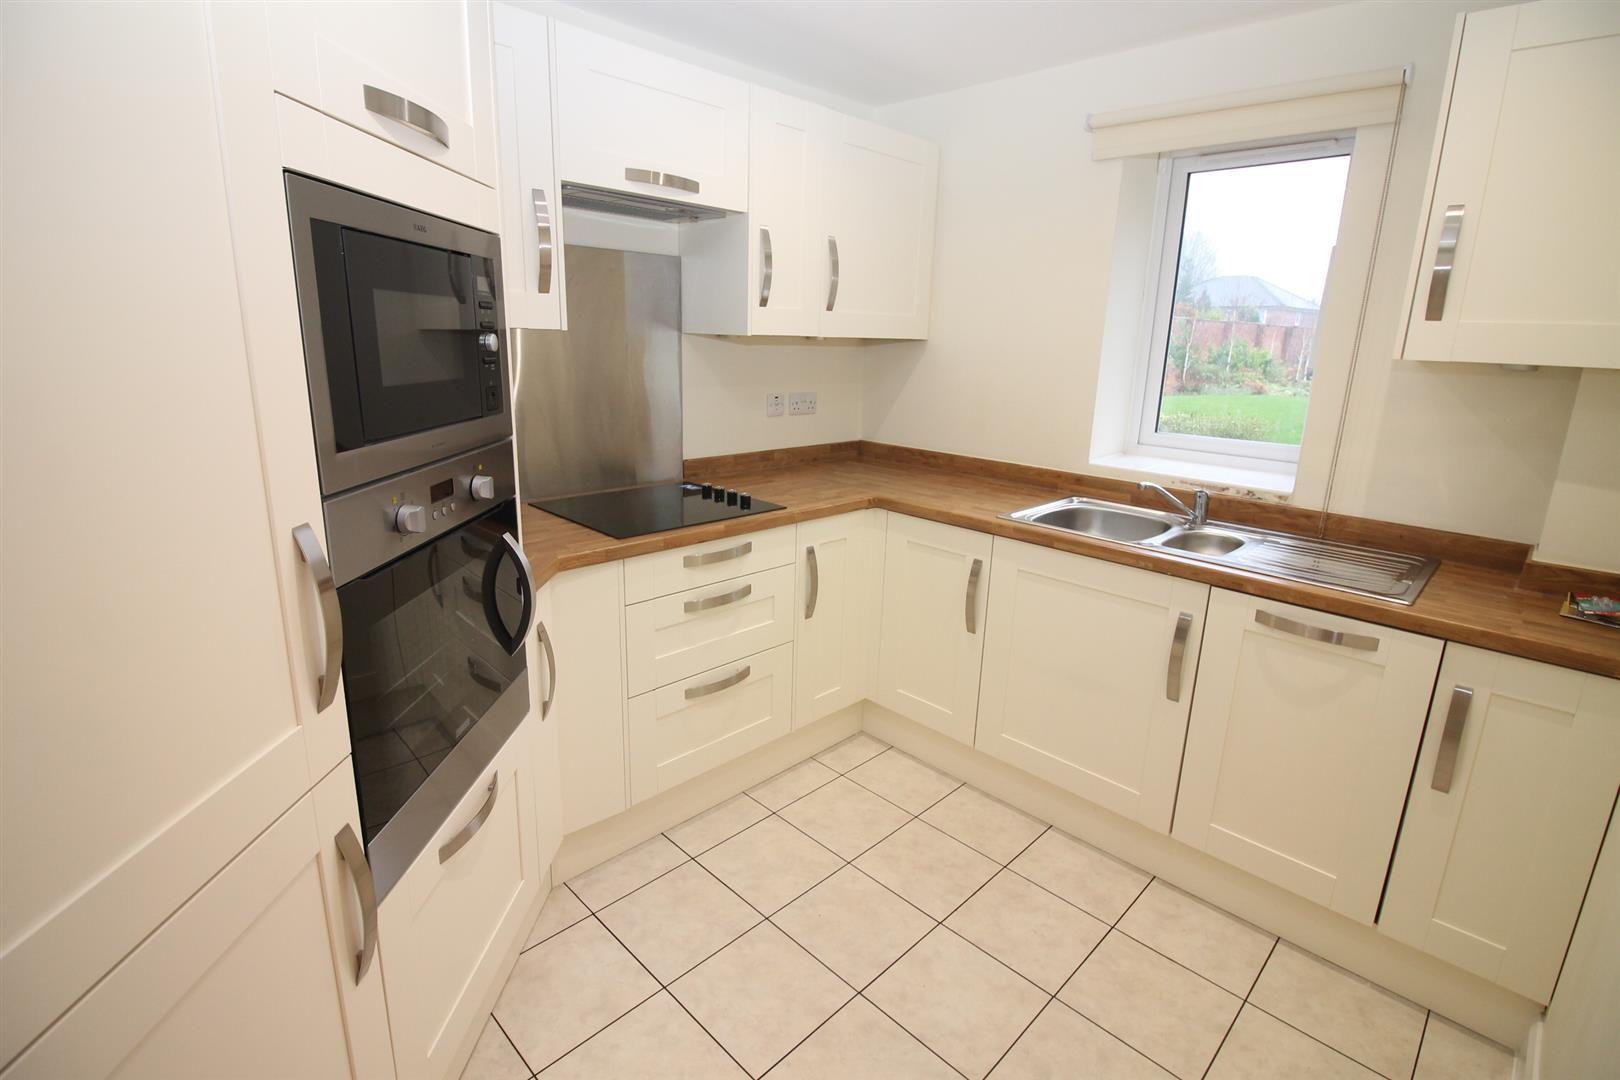 Property photo 1 of 9. Img_0860.Jpg